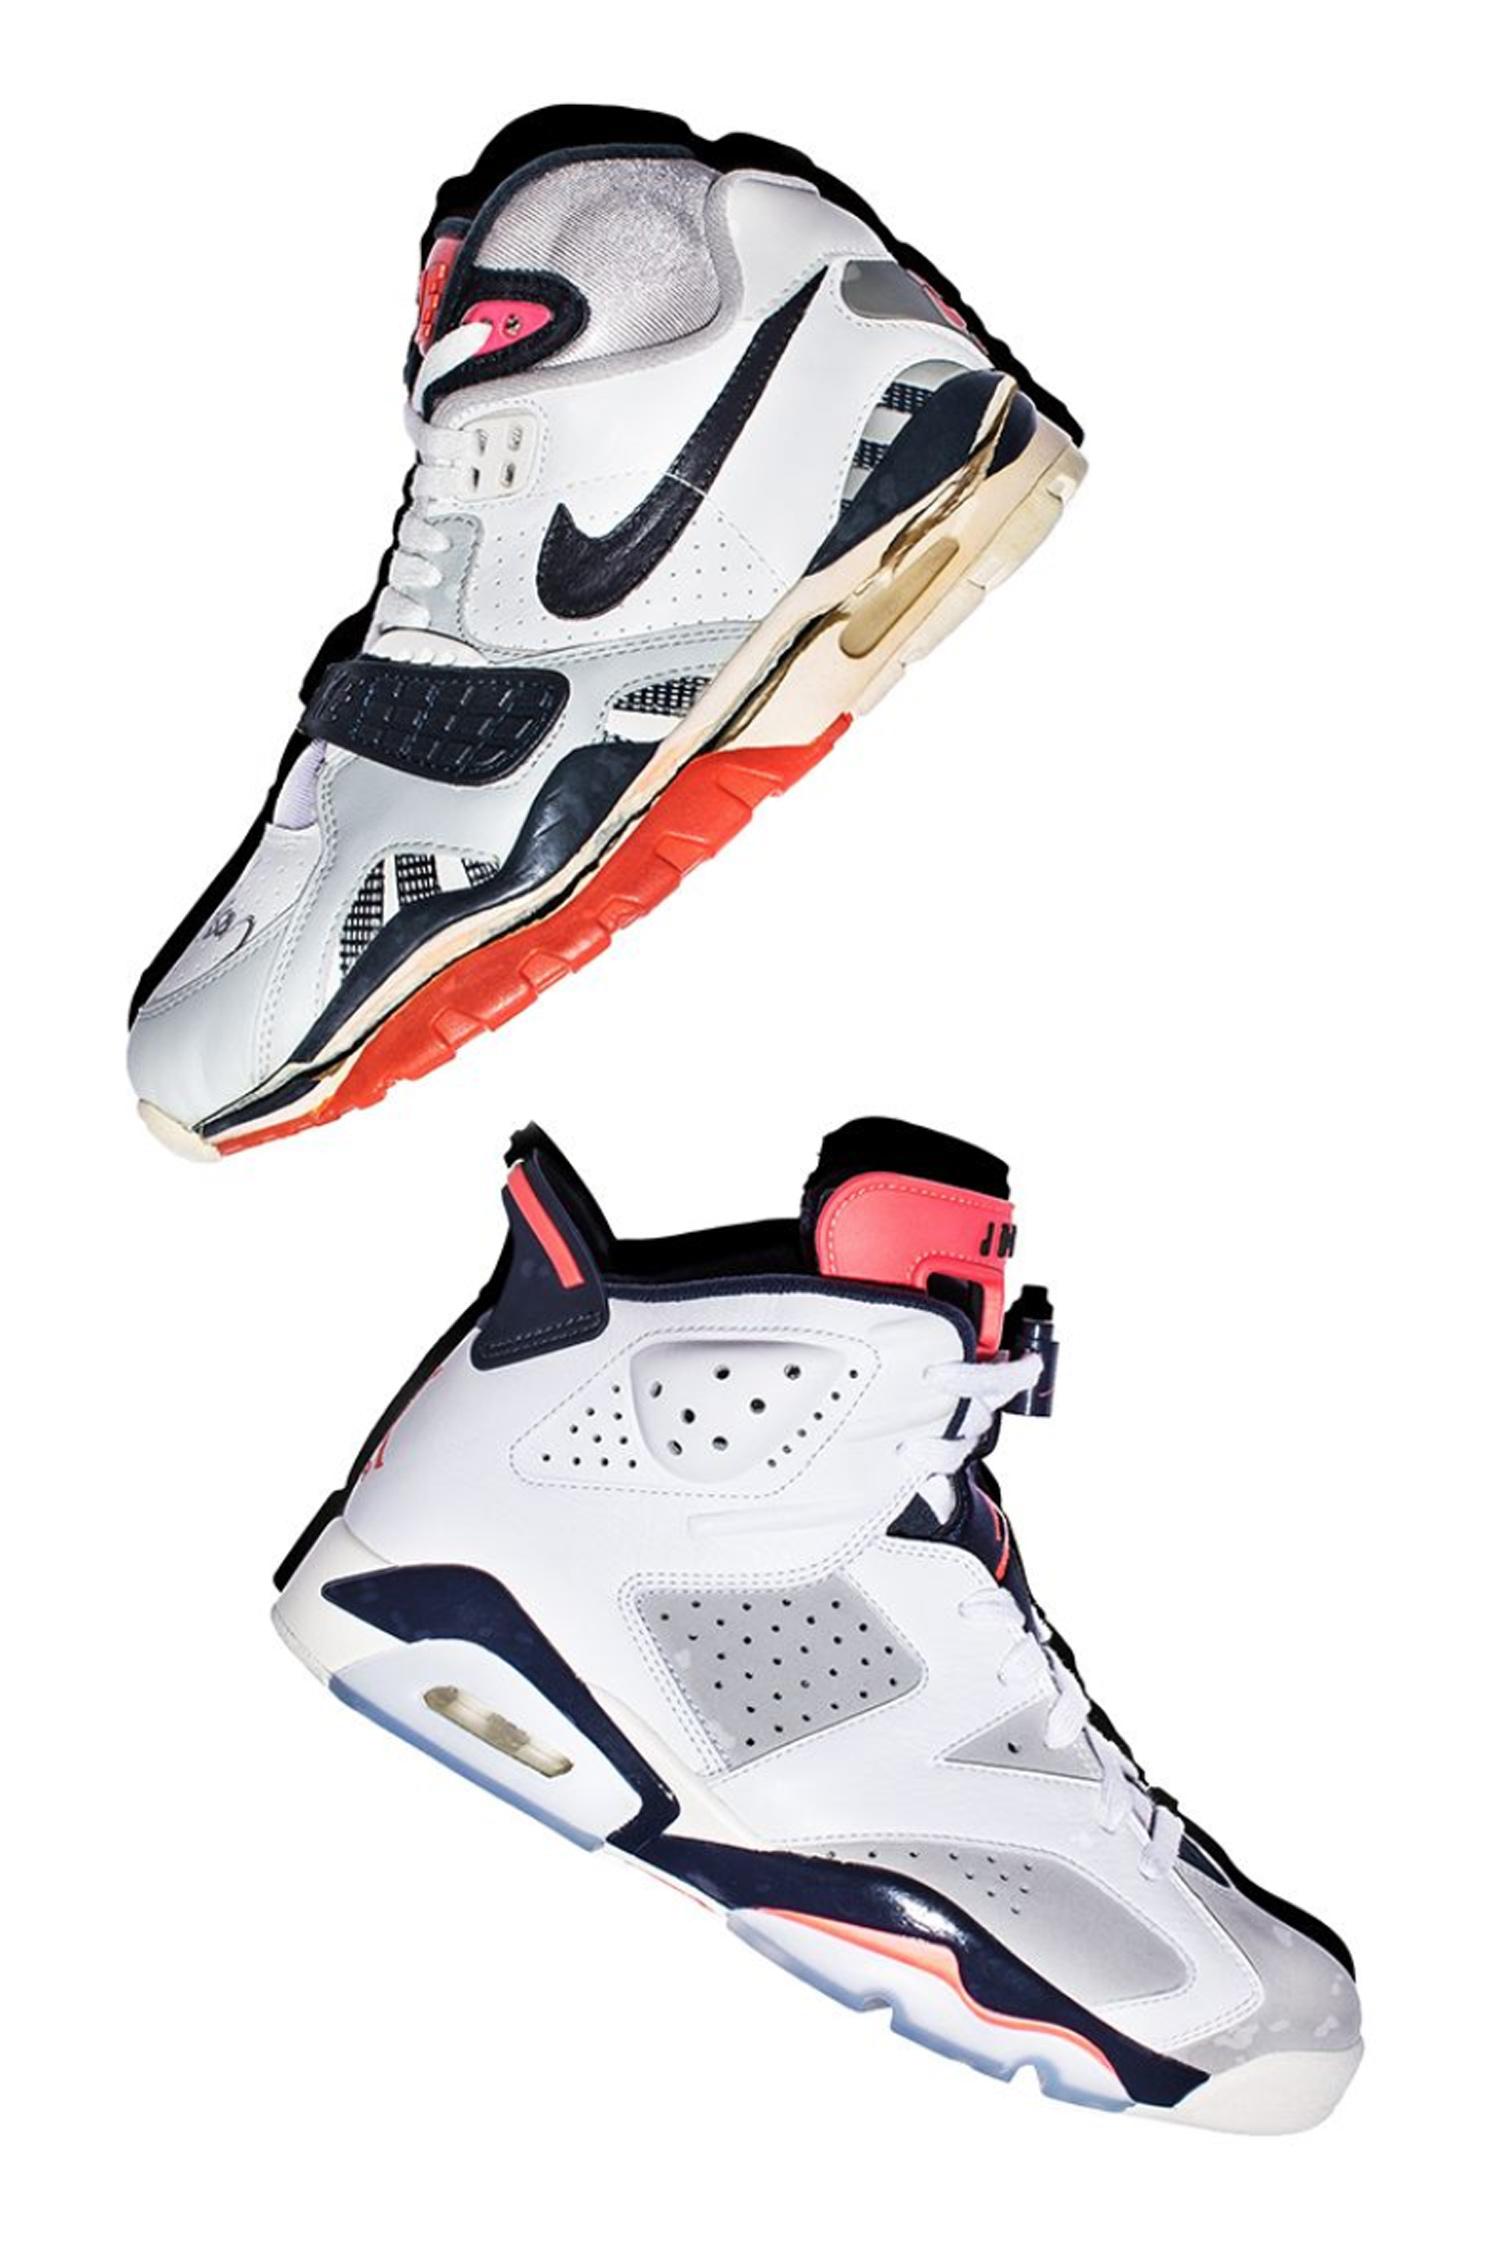 Air-Jordan-6-Tinker-Nike-Air-Trainer-SC-II - WearTesters d00020be6